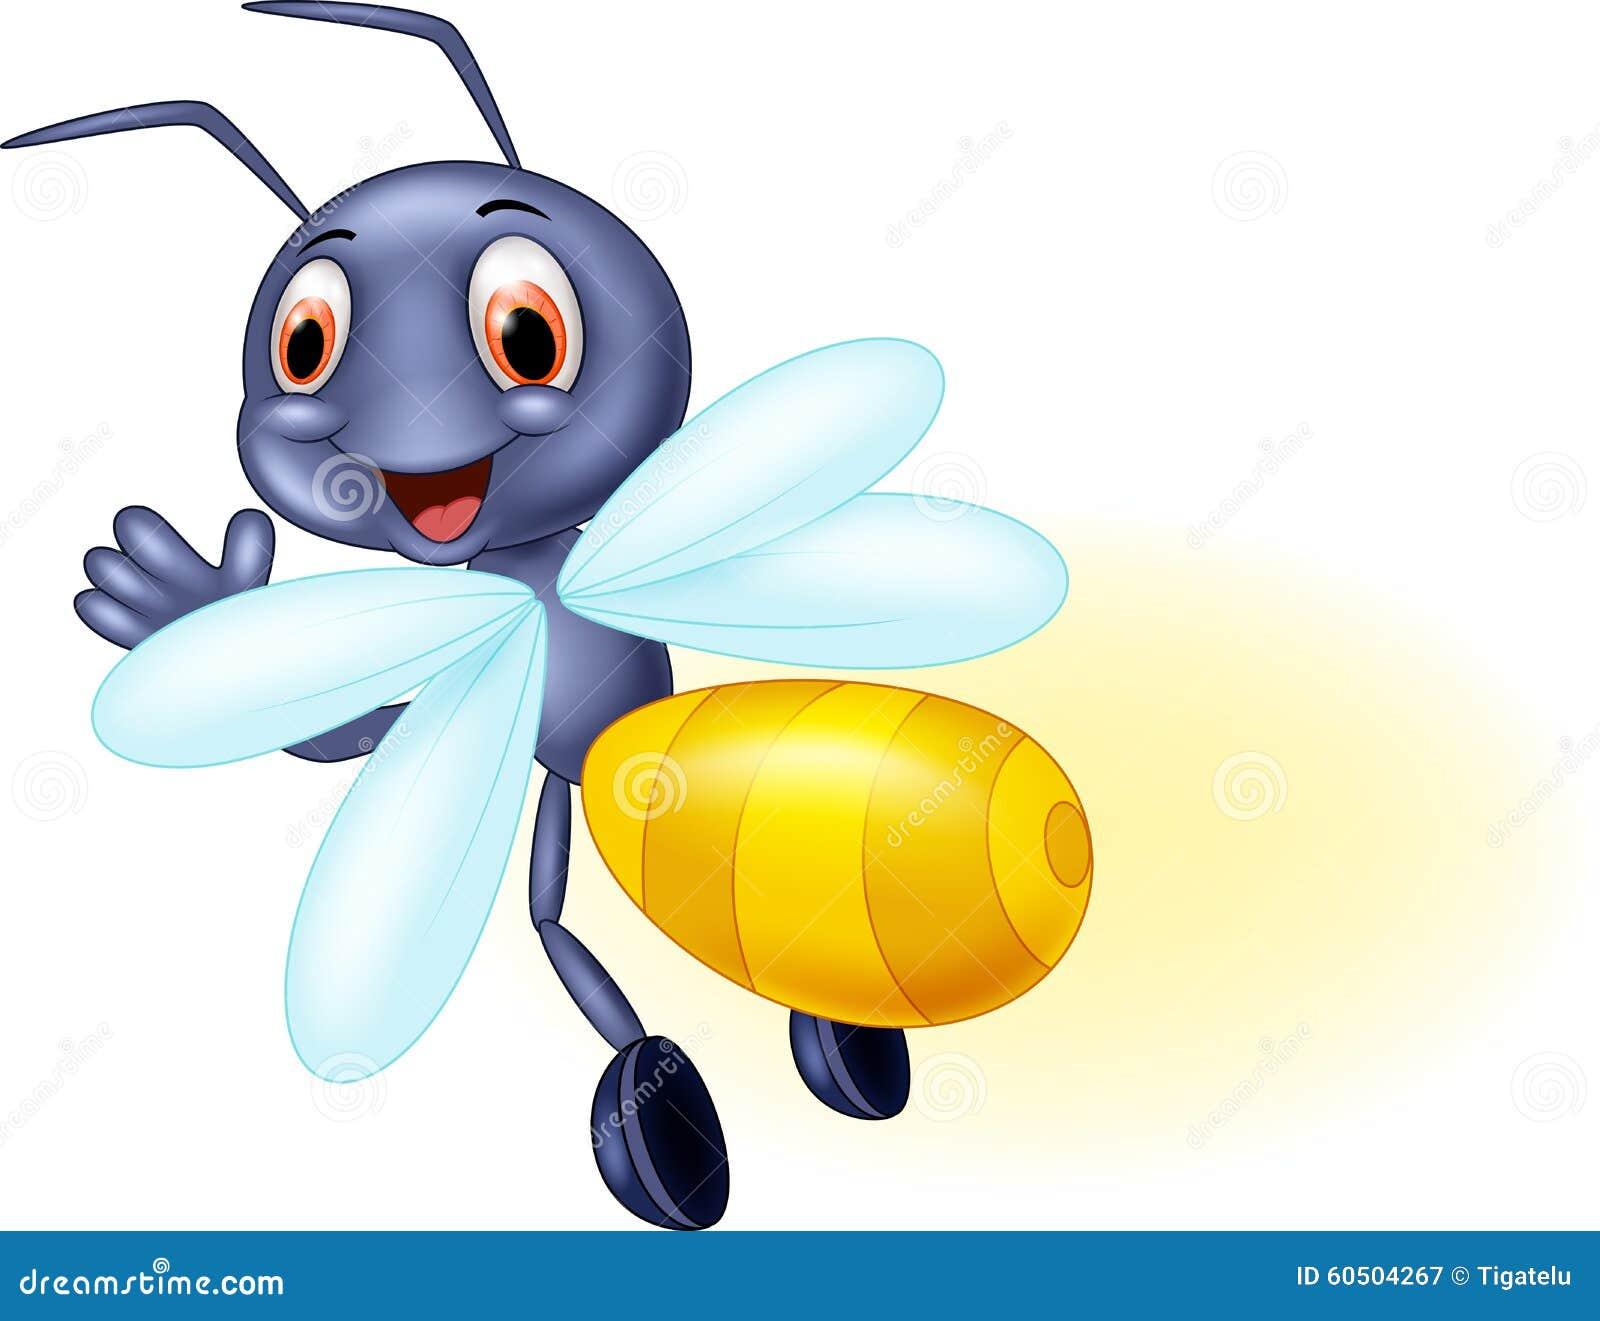 Firefly Stock Illustrations – 1,615 Firefly Stock Illustrations ... for firefly insect illustration  157uhy